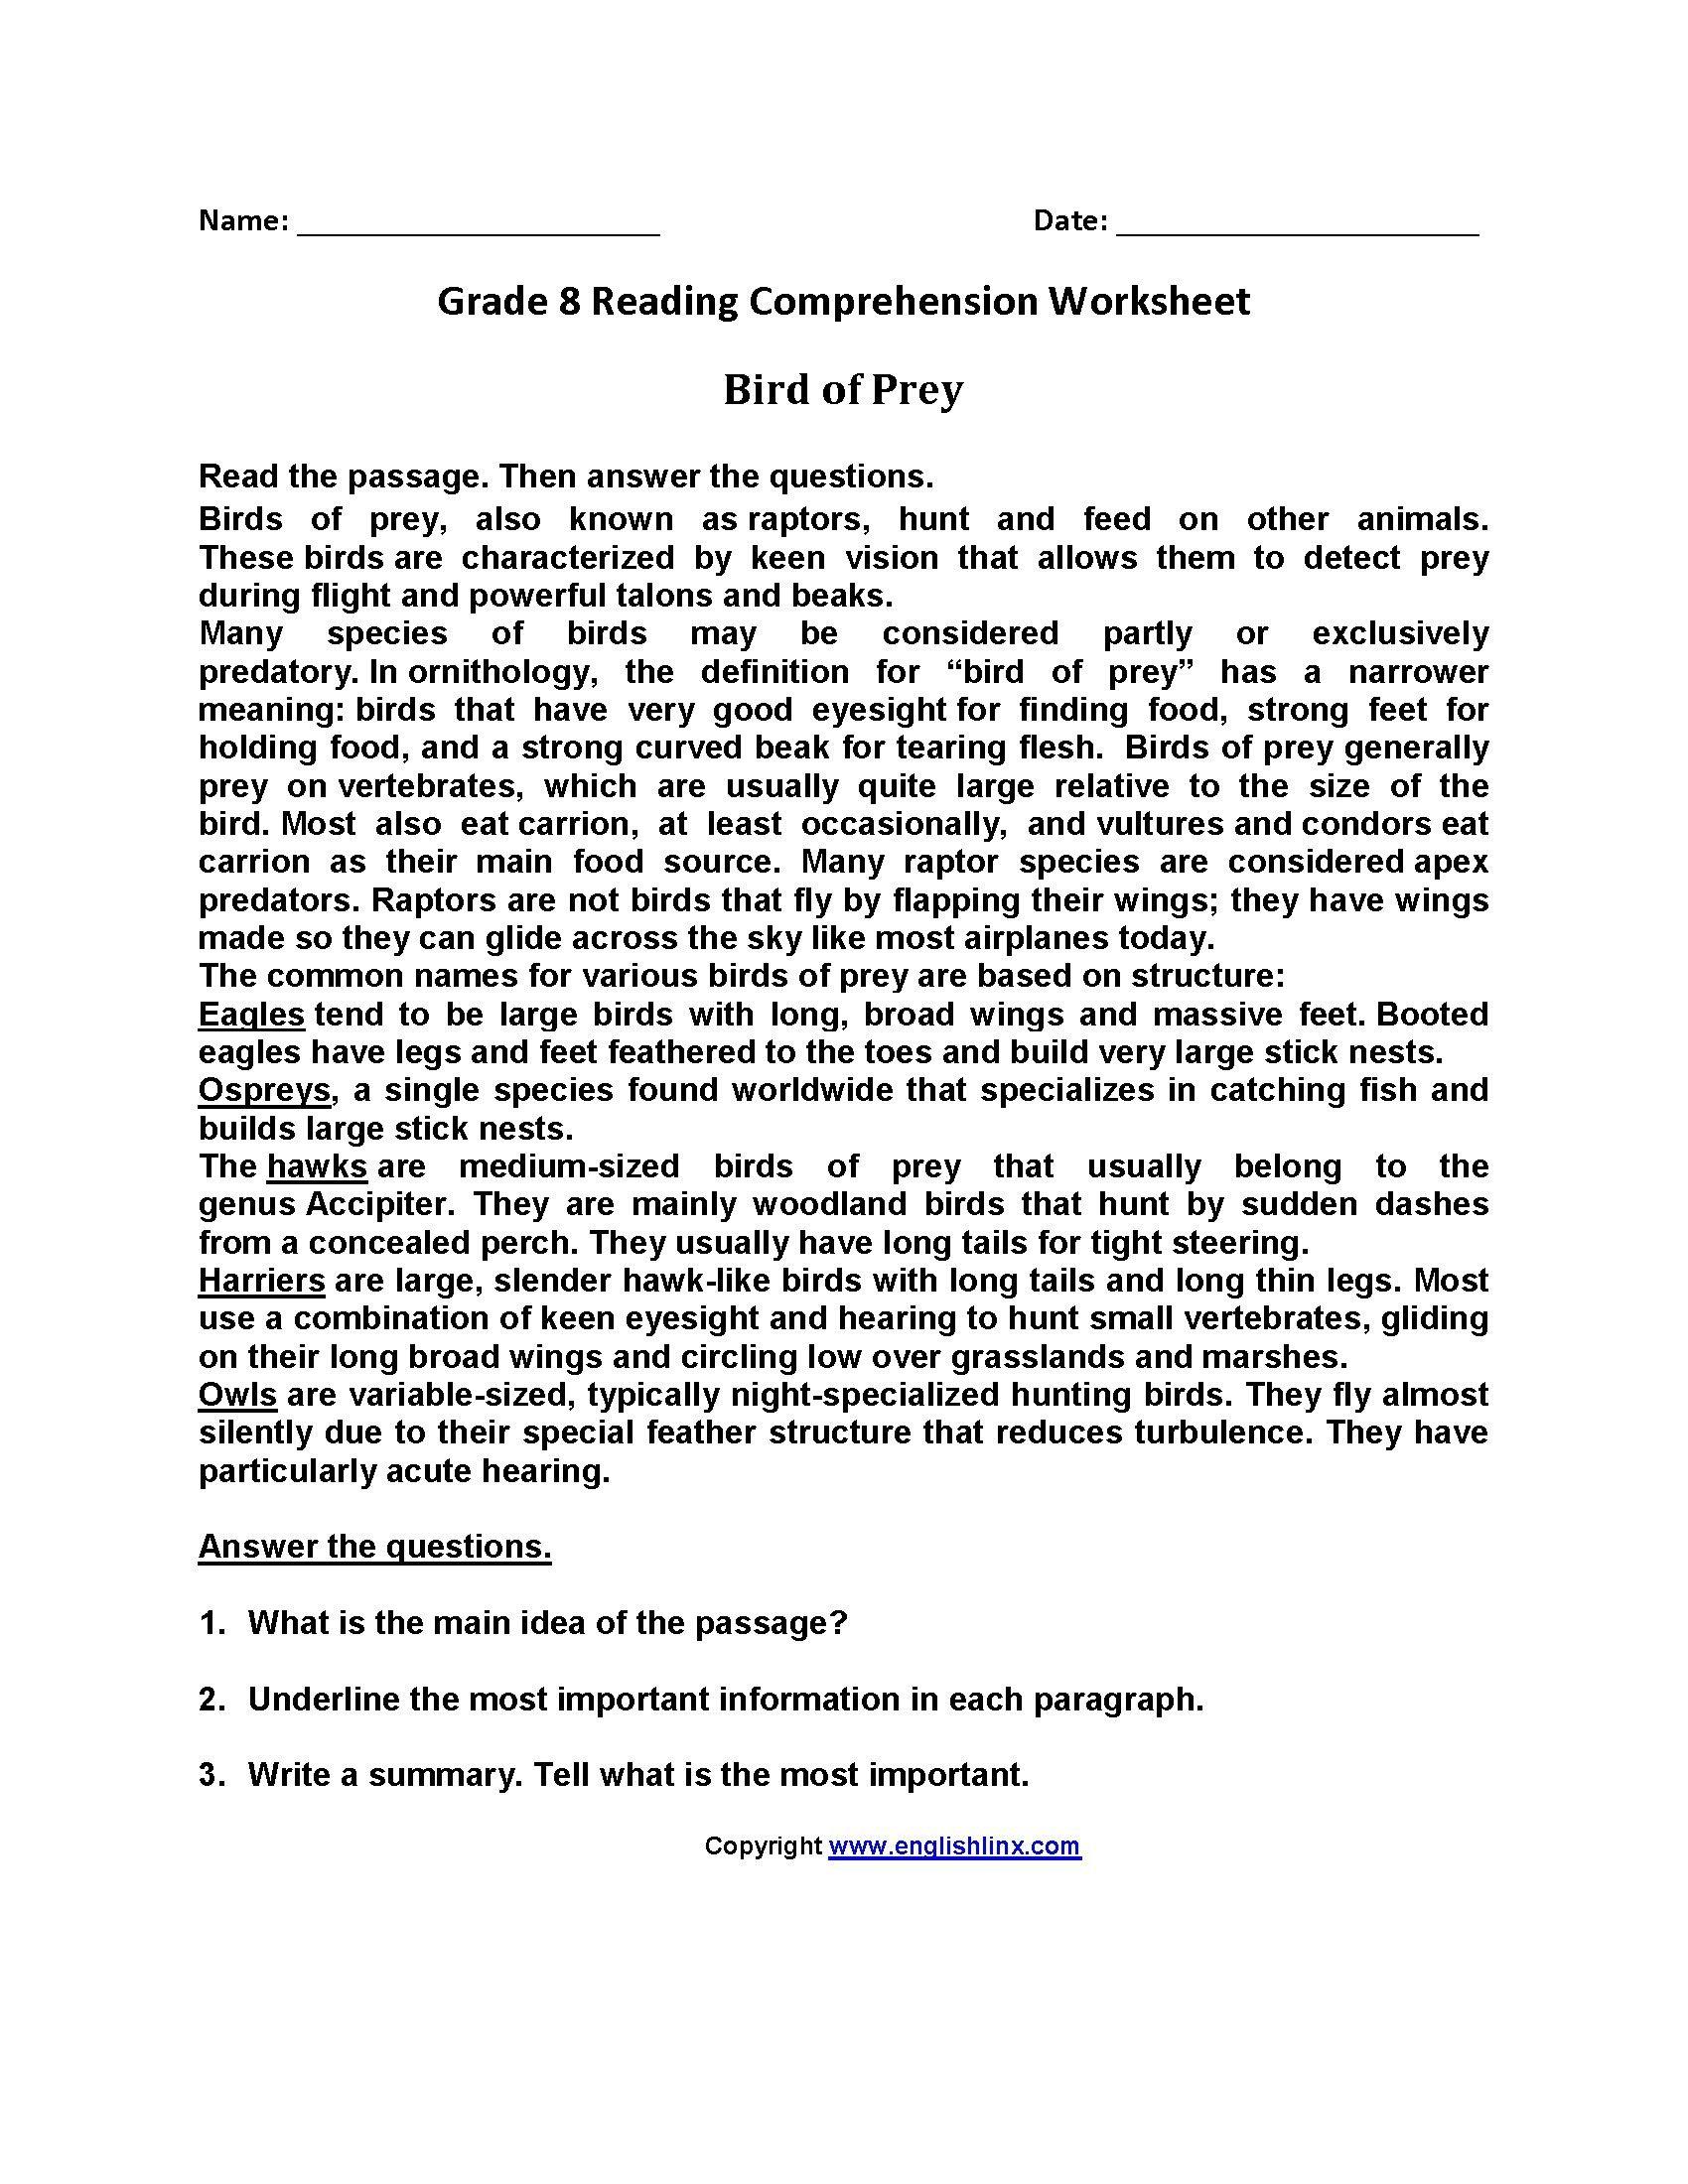 Worksheet Ideas Chap12 Proofreading Practice Worksheets Reading Worksheets Comprehension Worksheets Reading Comprehension Worksheets